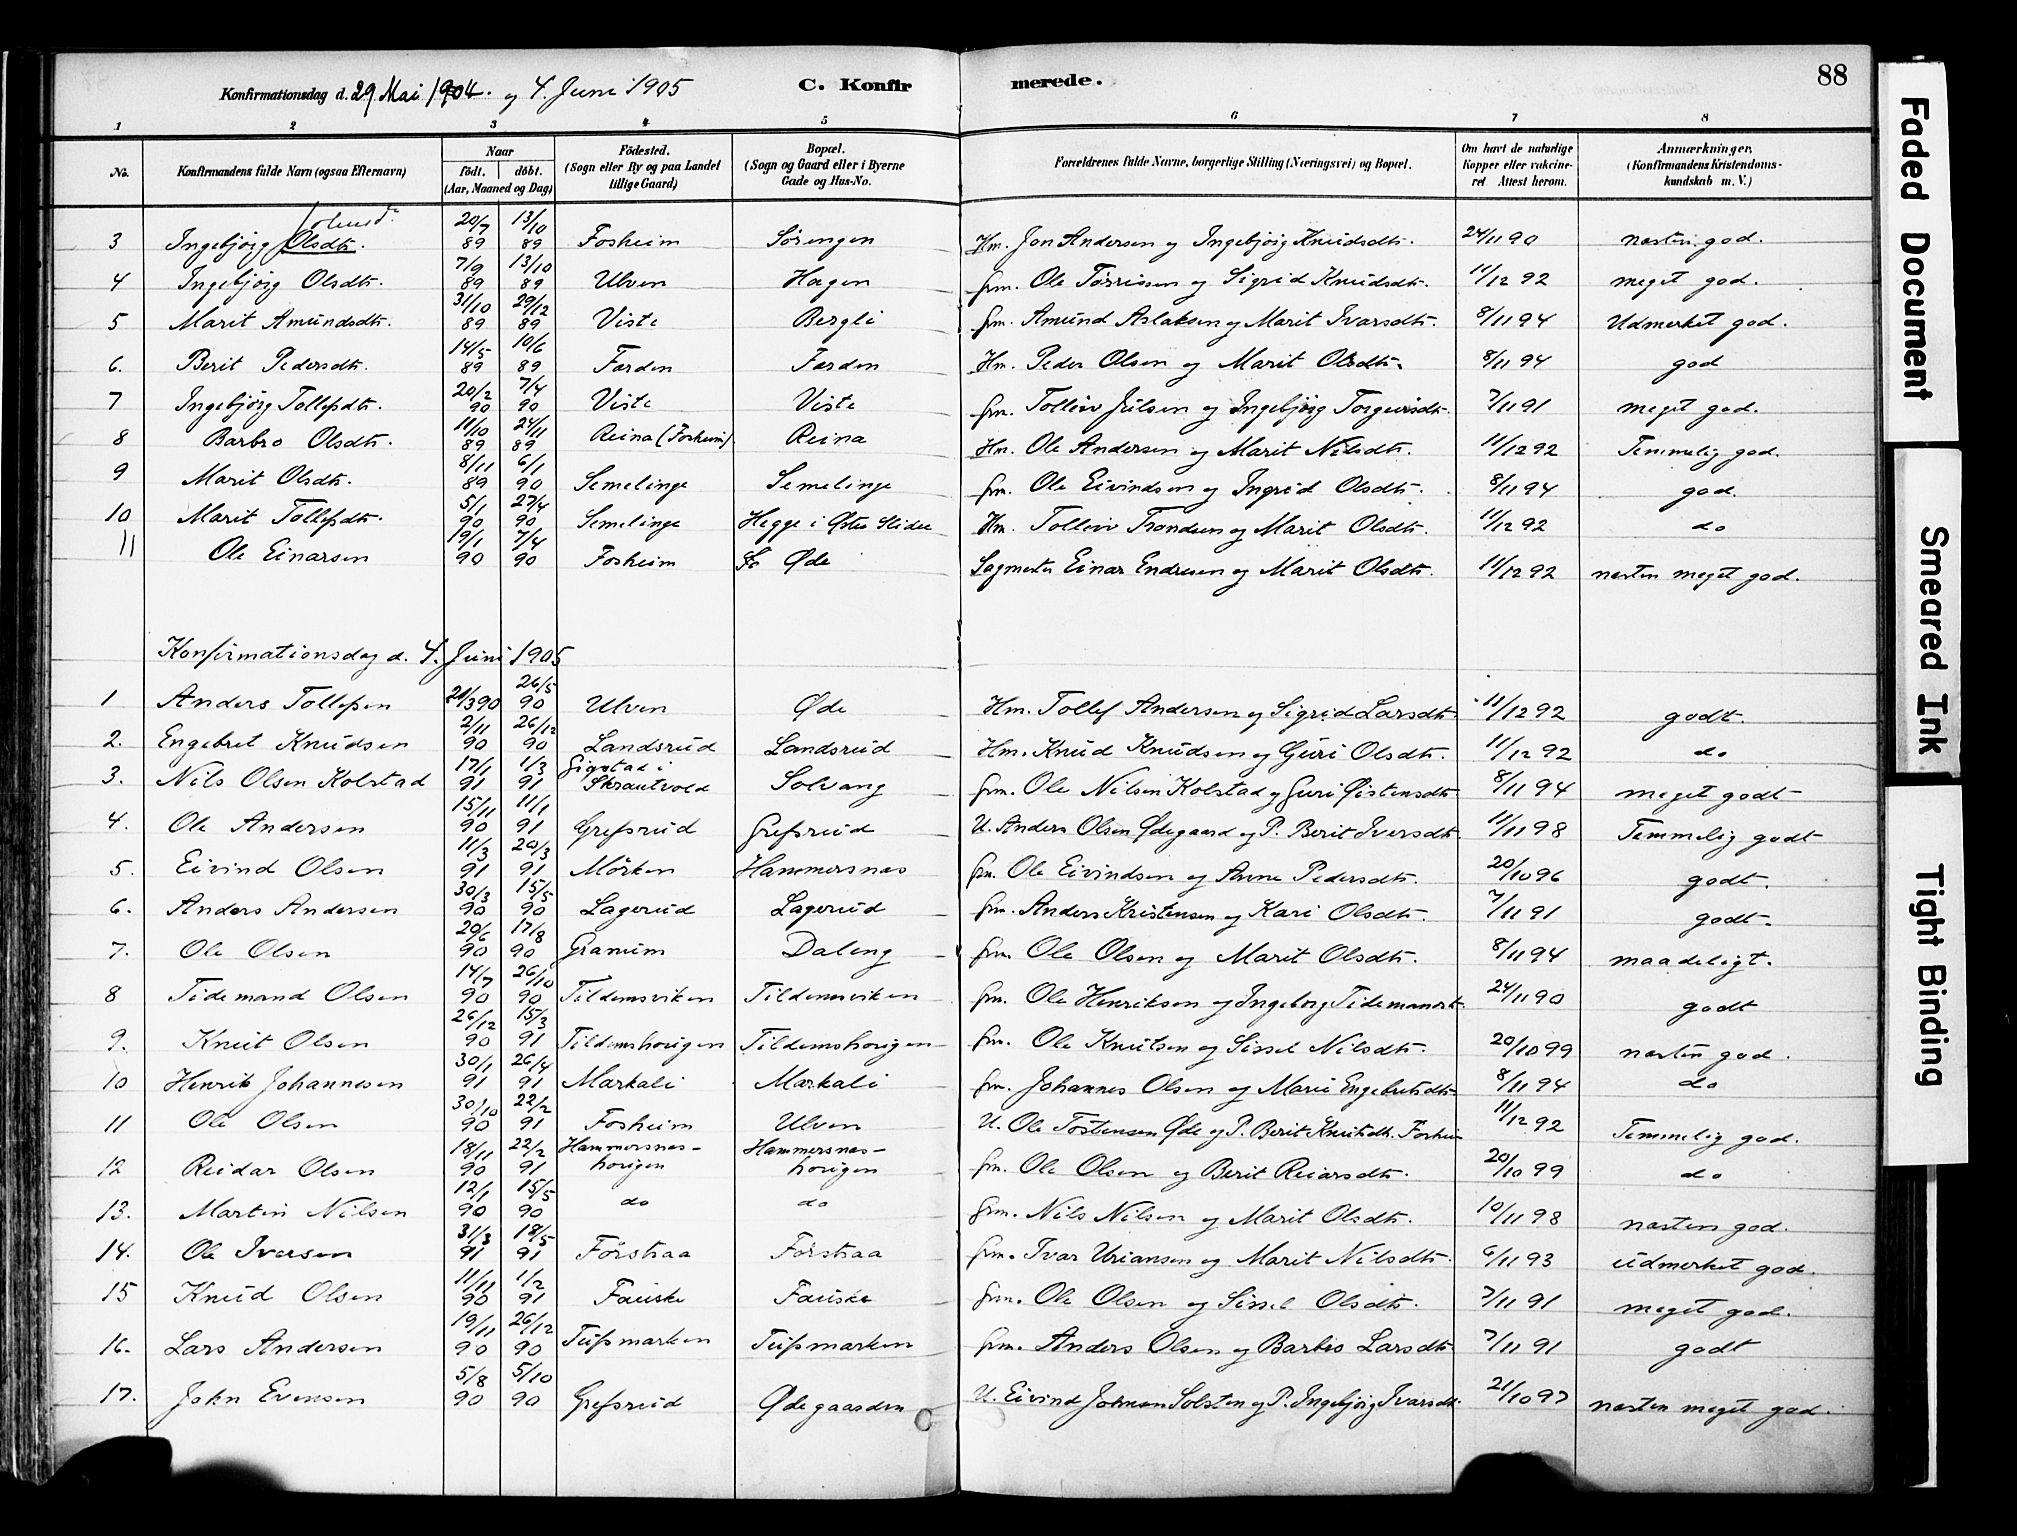 SAH, Vestre Slidre prestekontor, Ministerialbok nr. 6, 1881-1912, s. 88